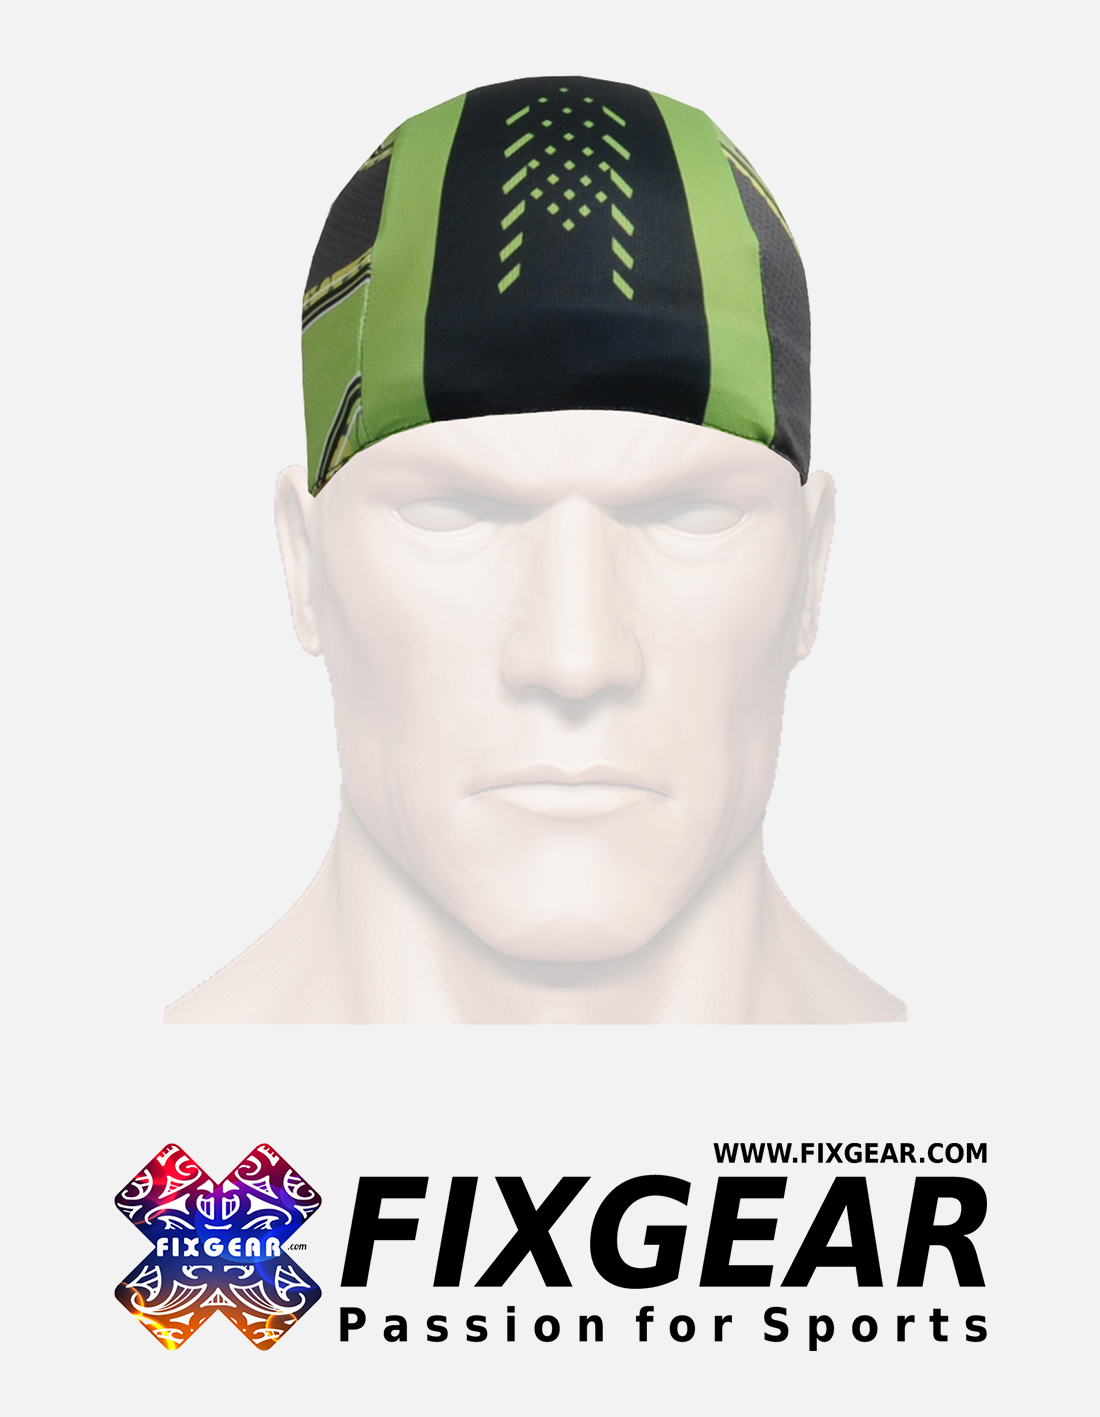 FIXGEAR D-75 Cycling Skull cap, Bandana